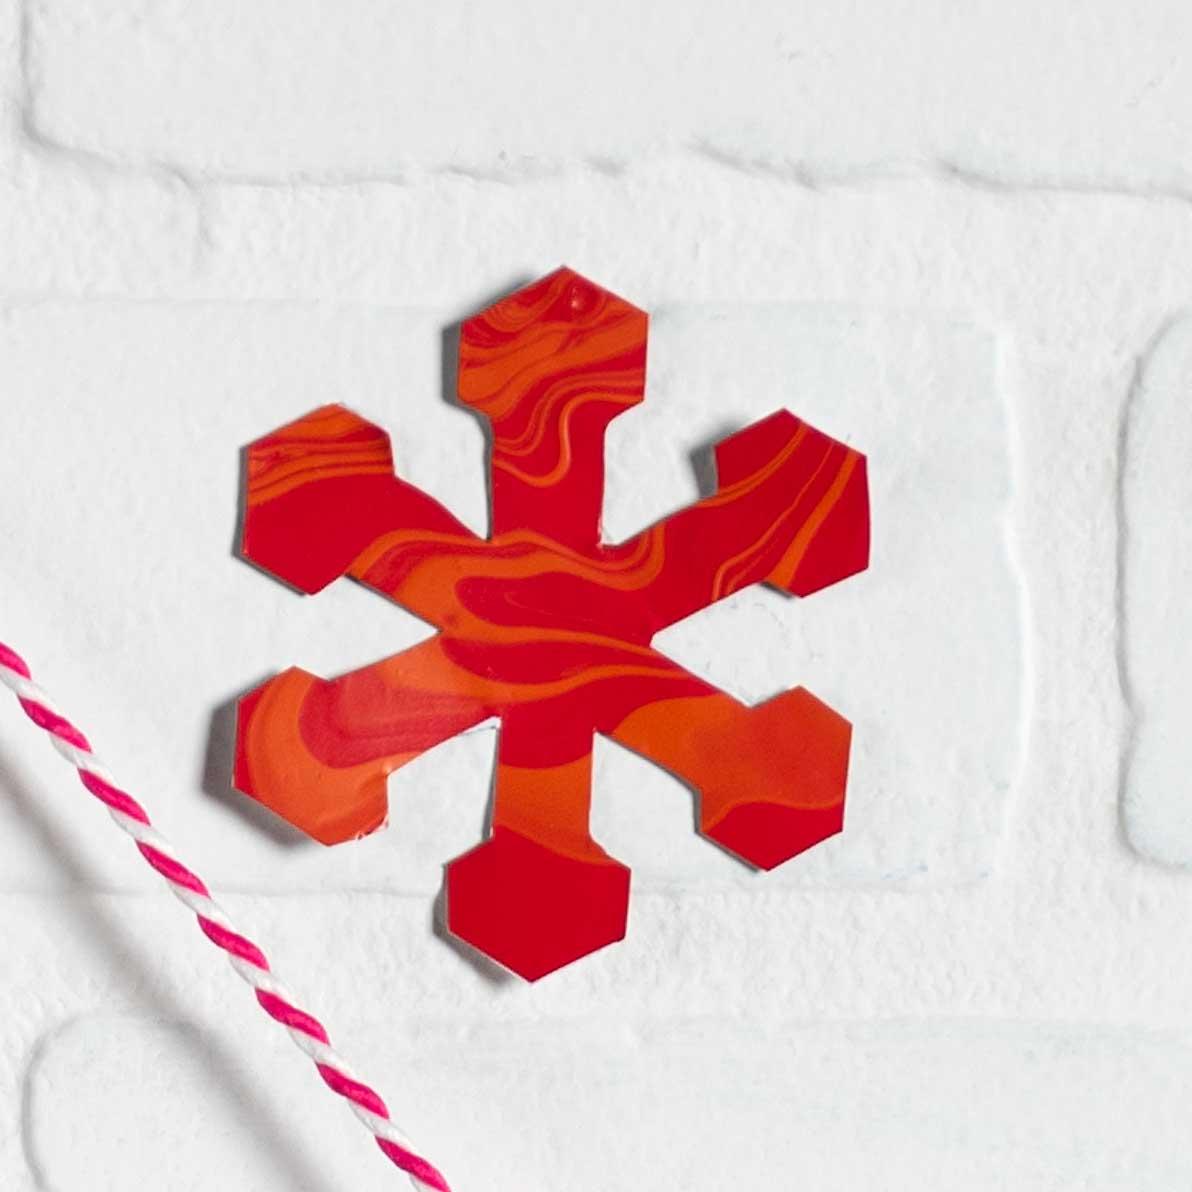 Holiday Home Decor: Fa La La Banner & Snowflake Paint Skins